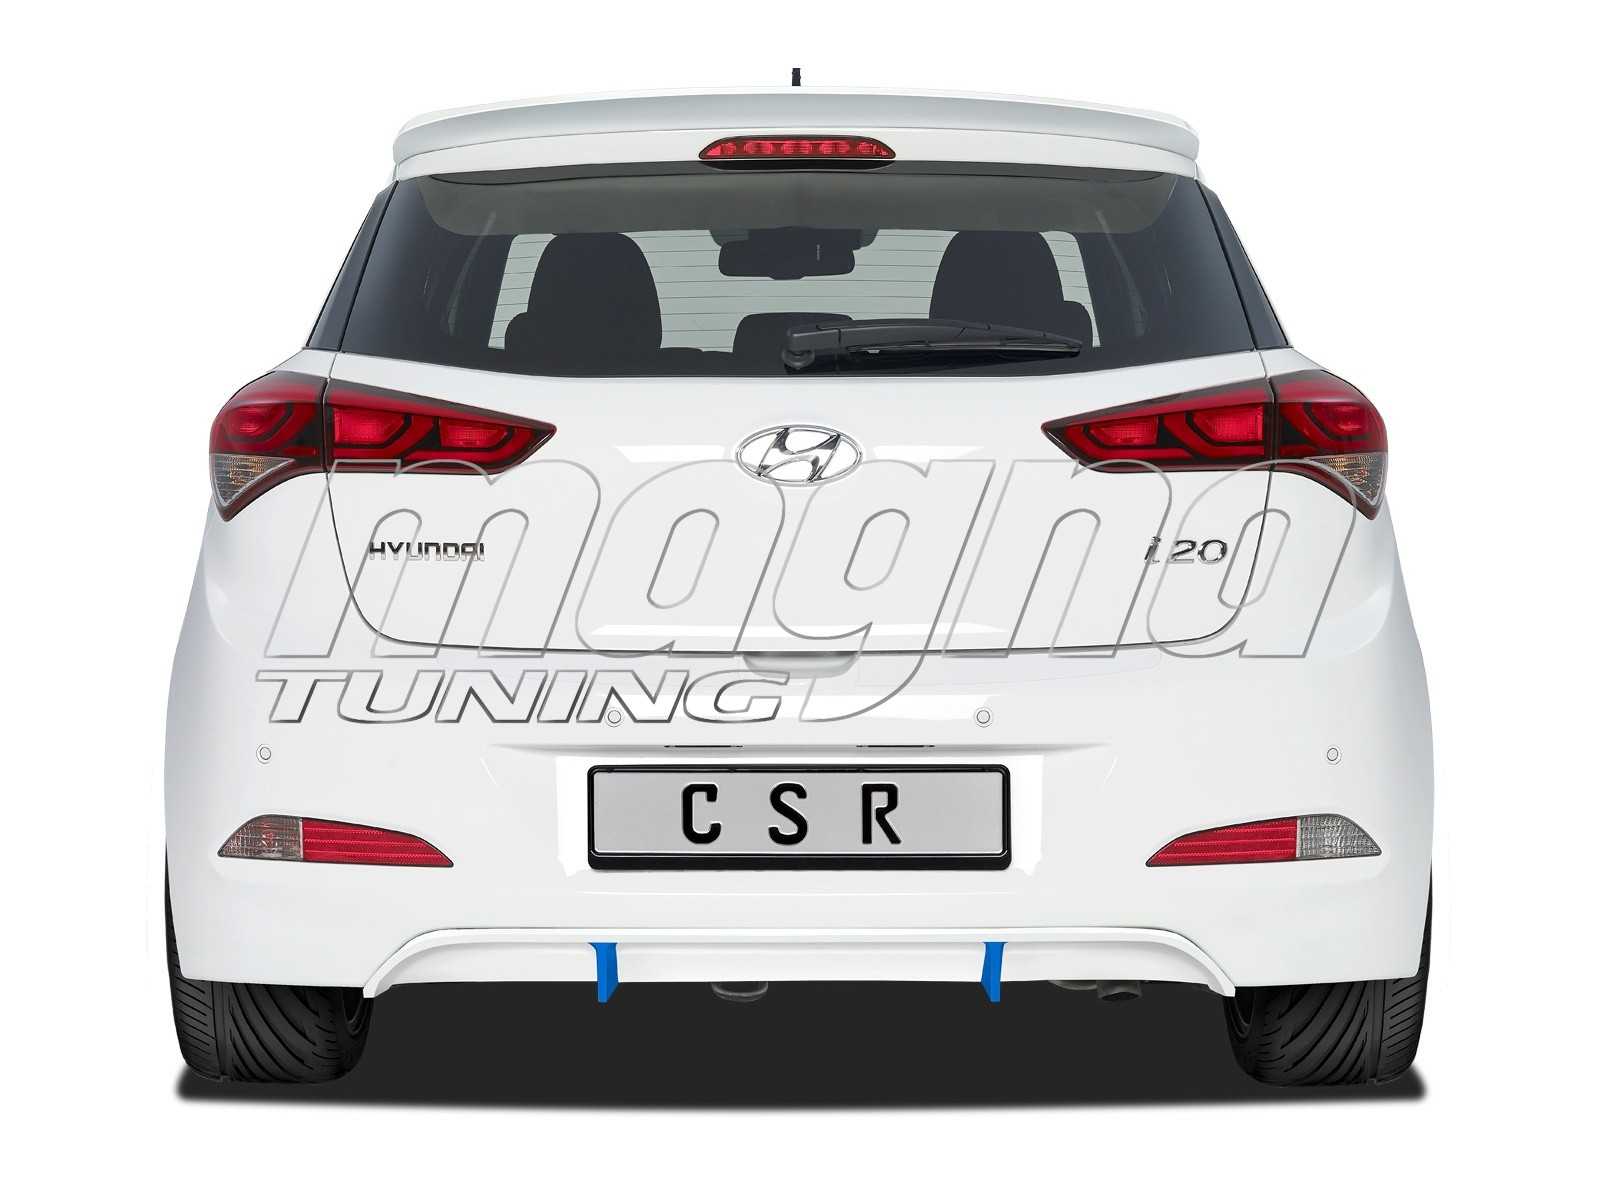 Hyundai I20 MK2 Crono Body kit